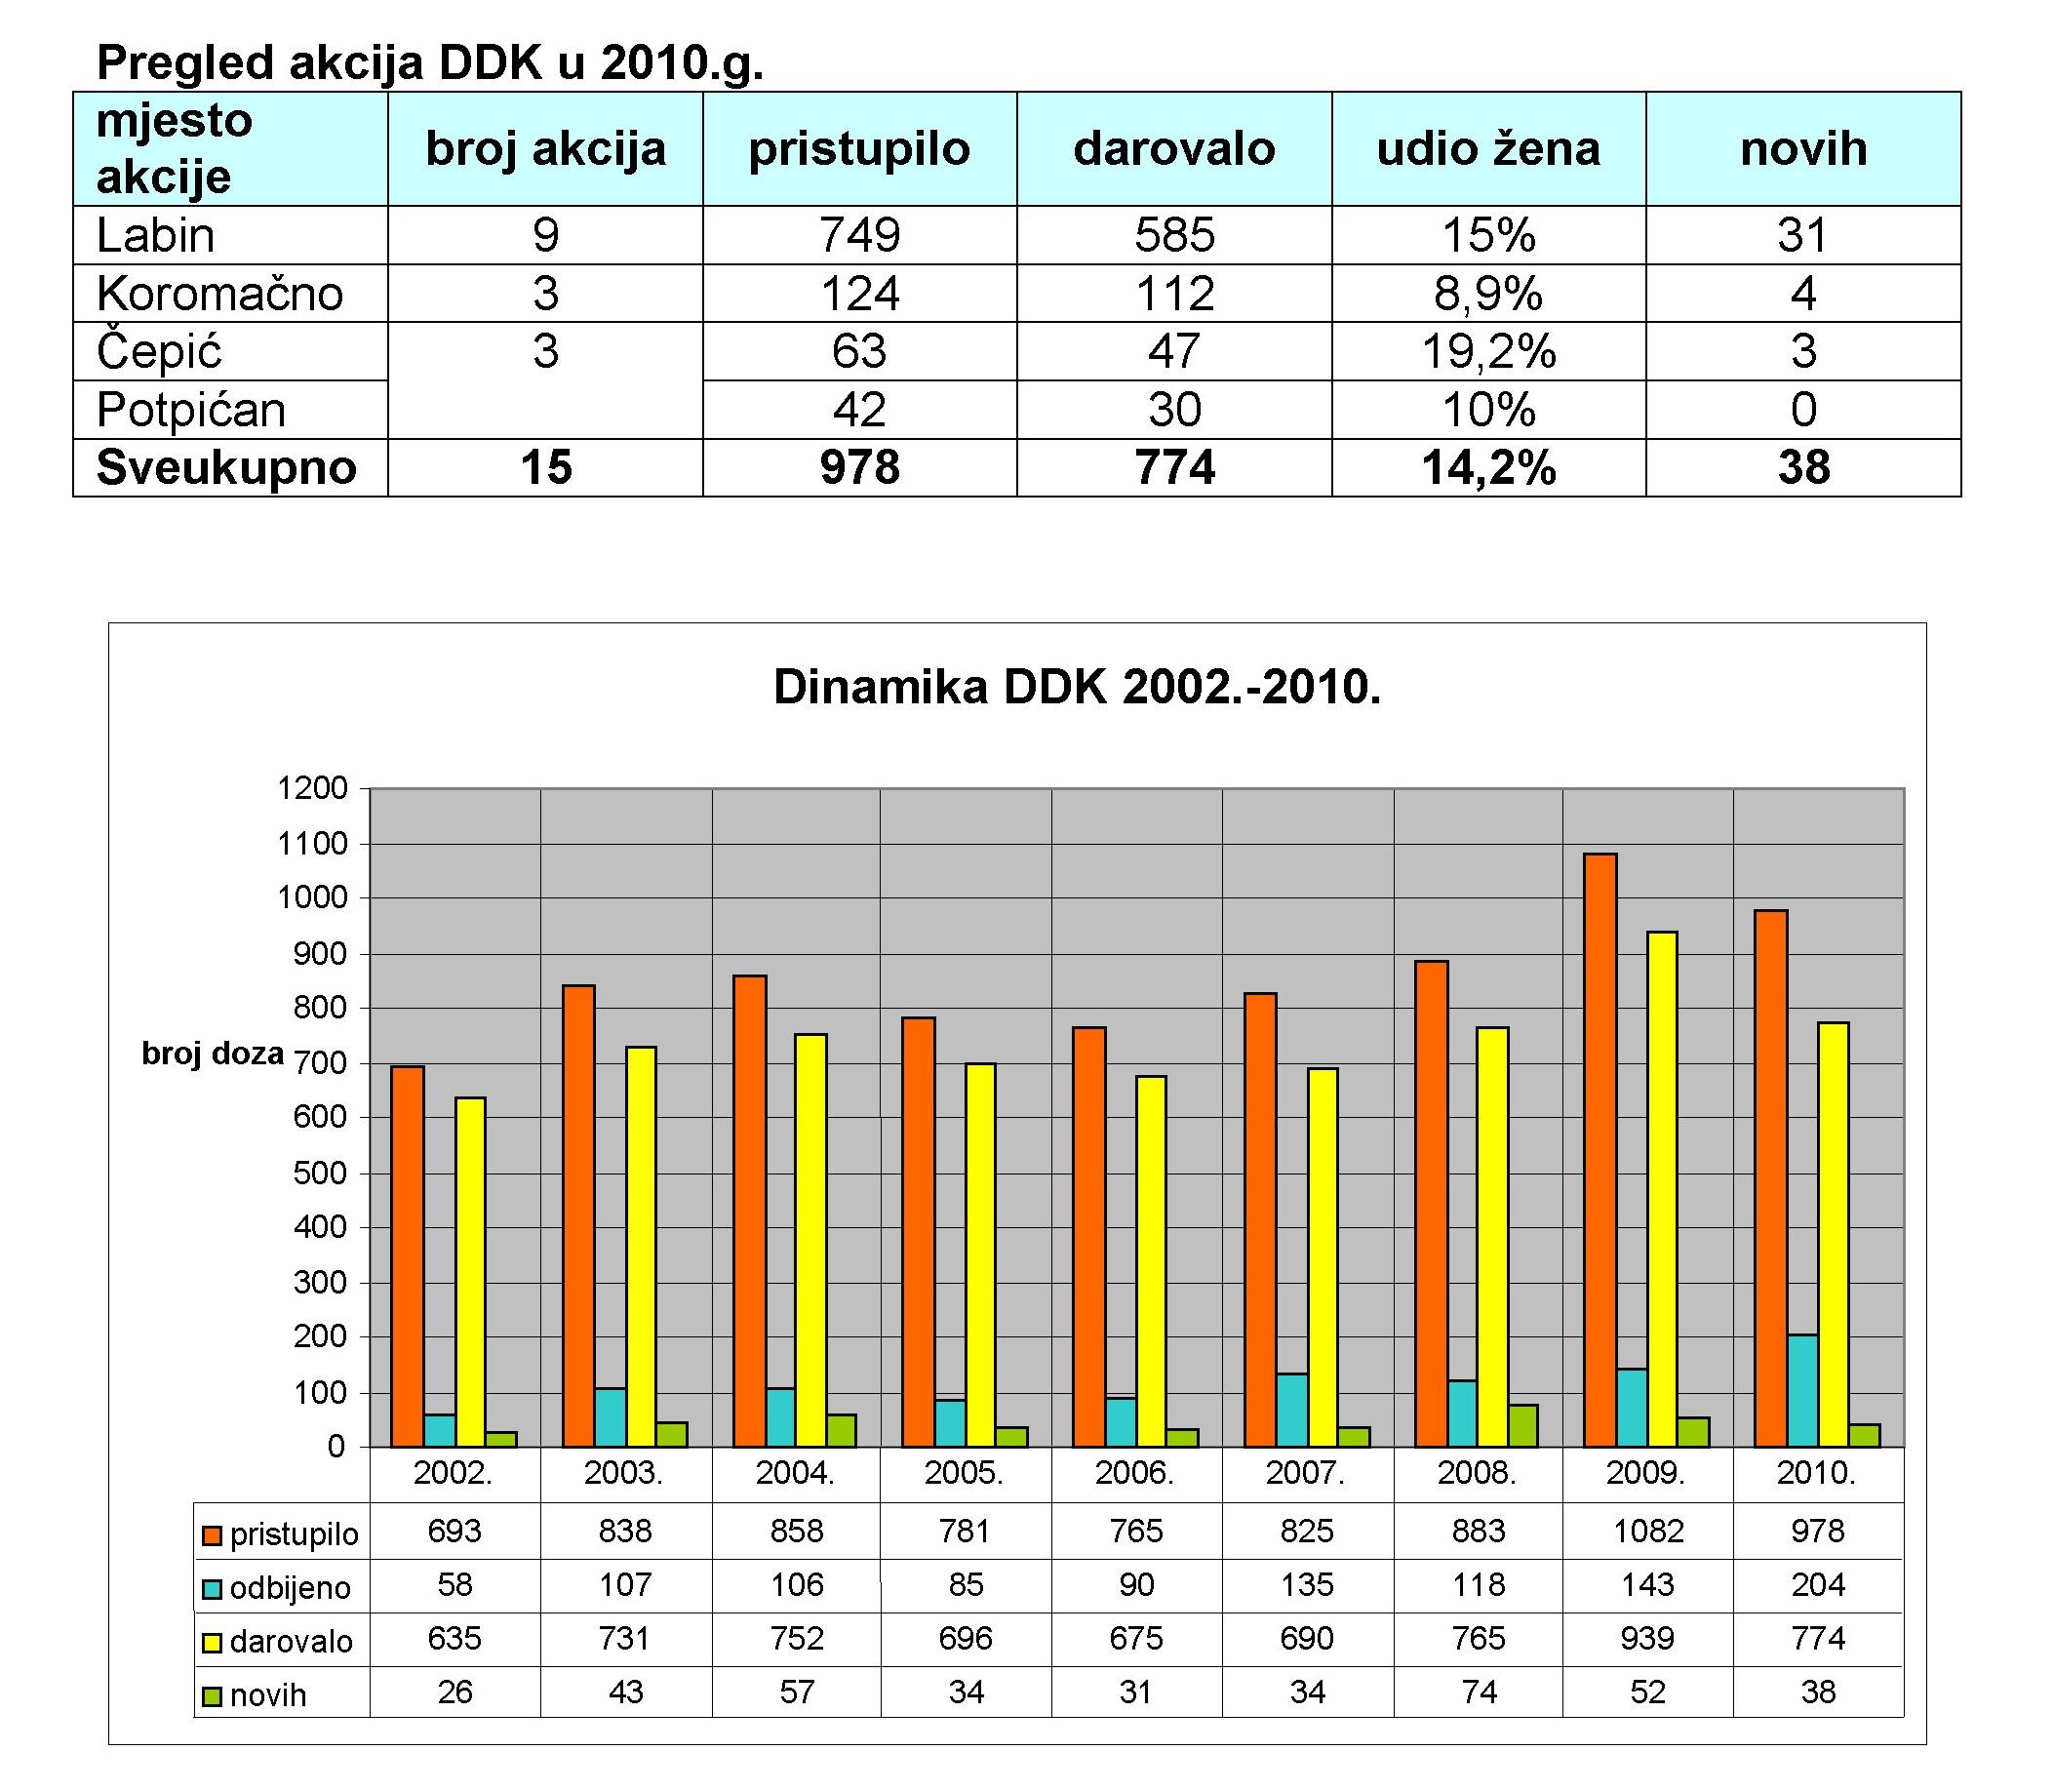 ddk-2010